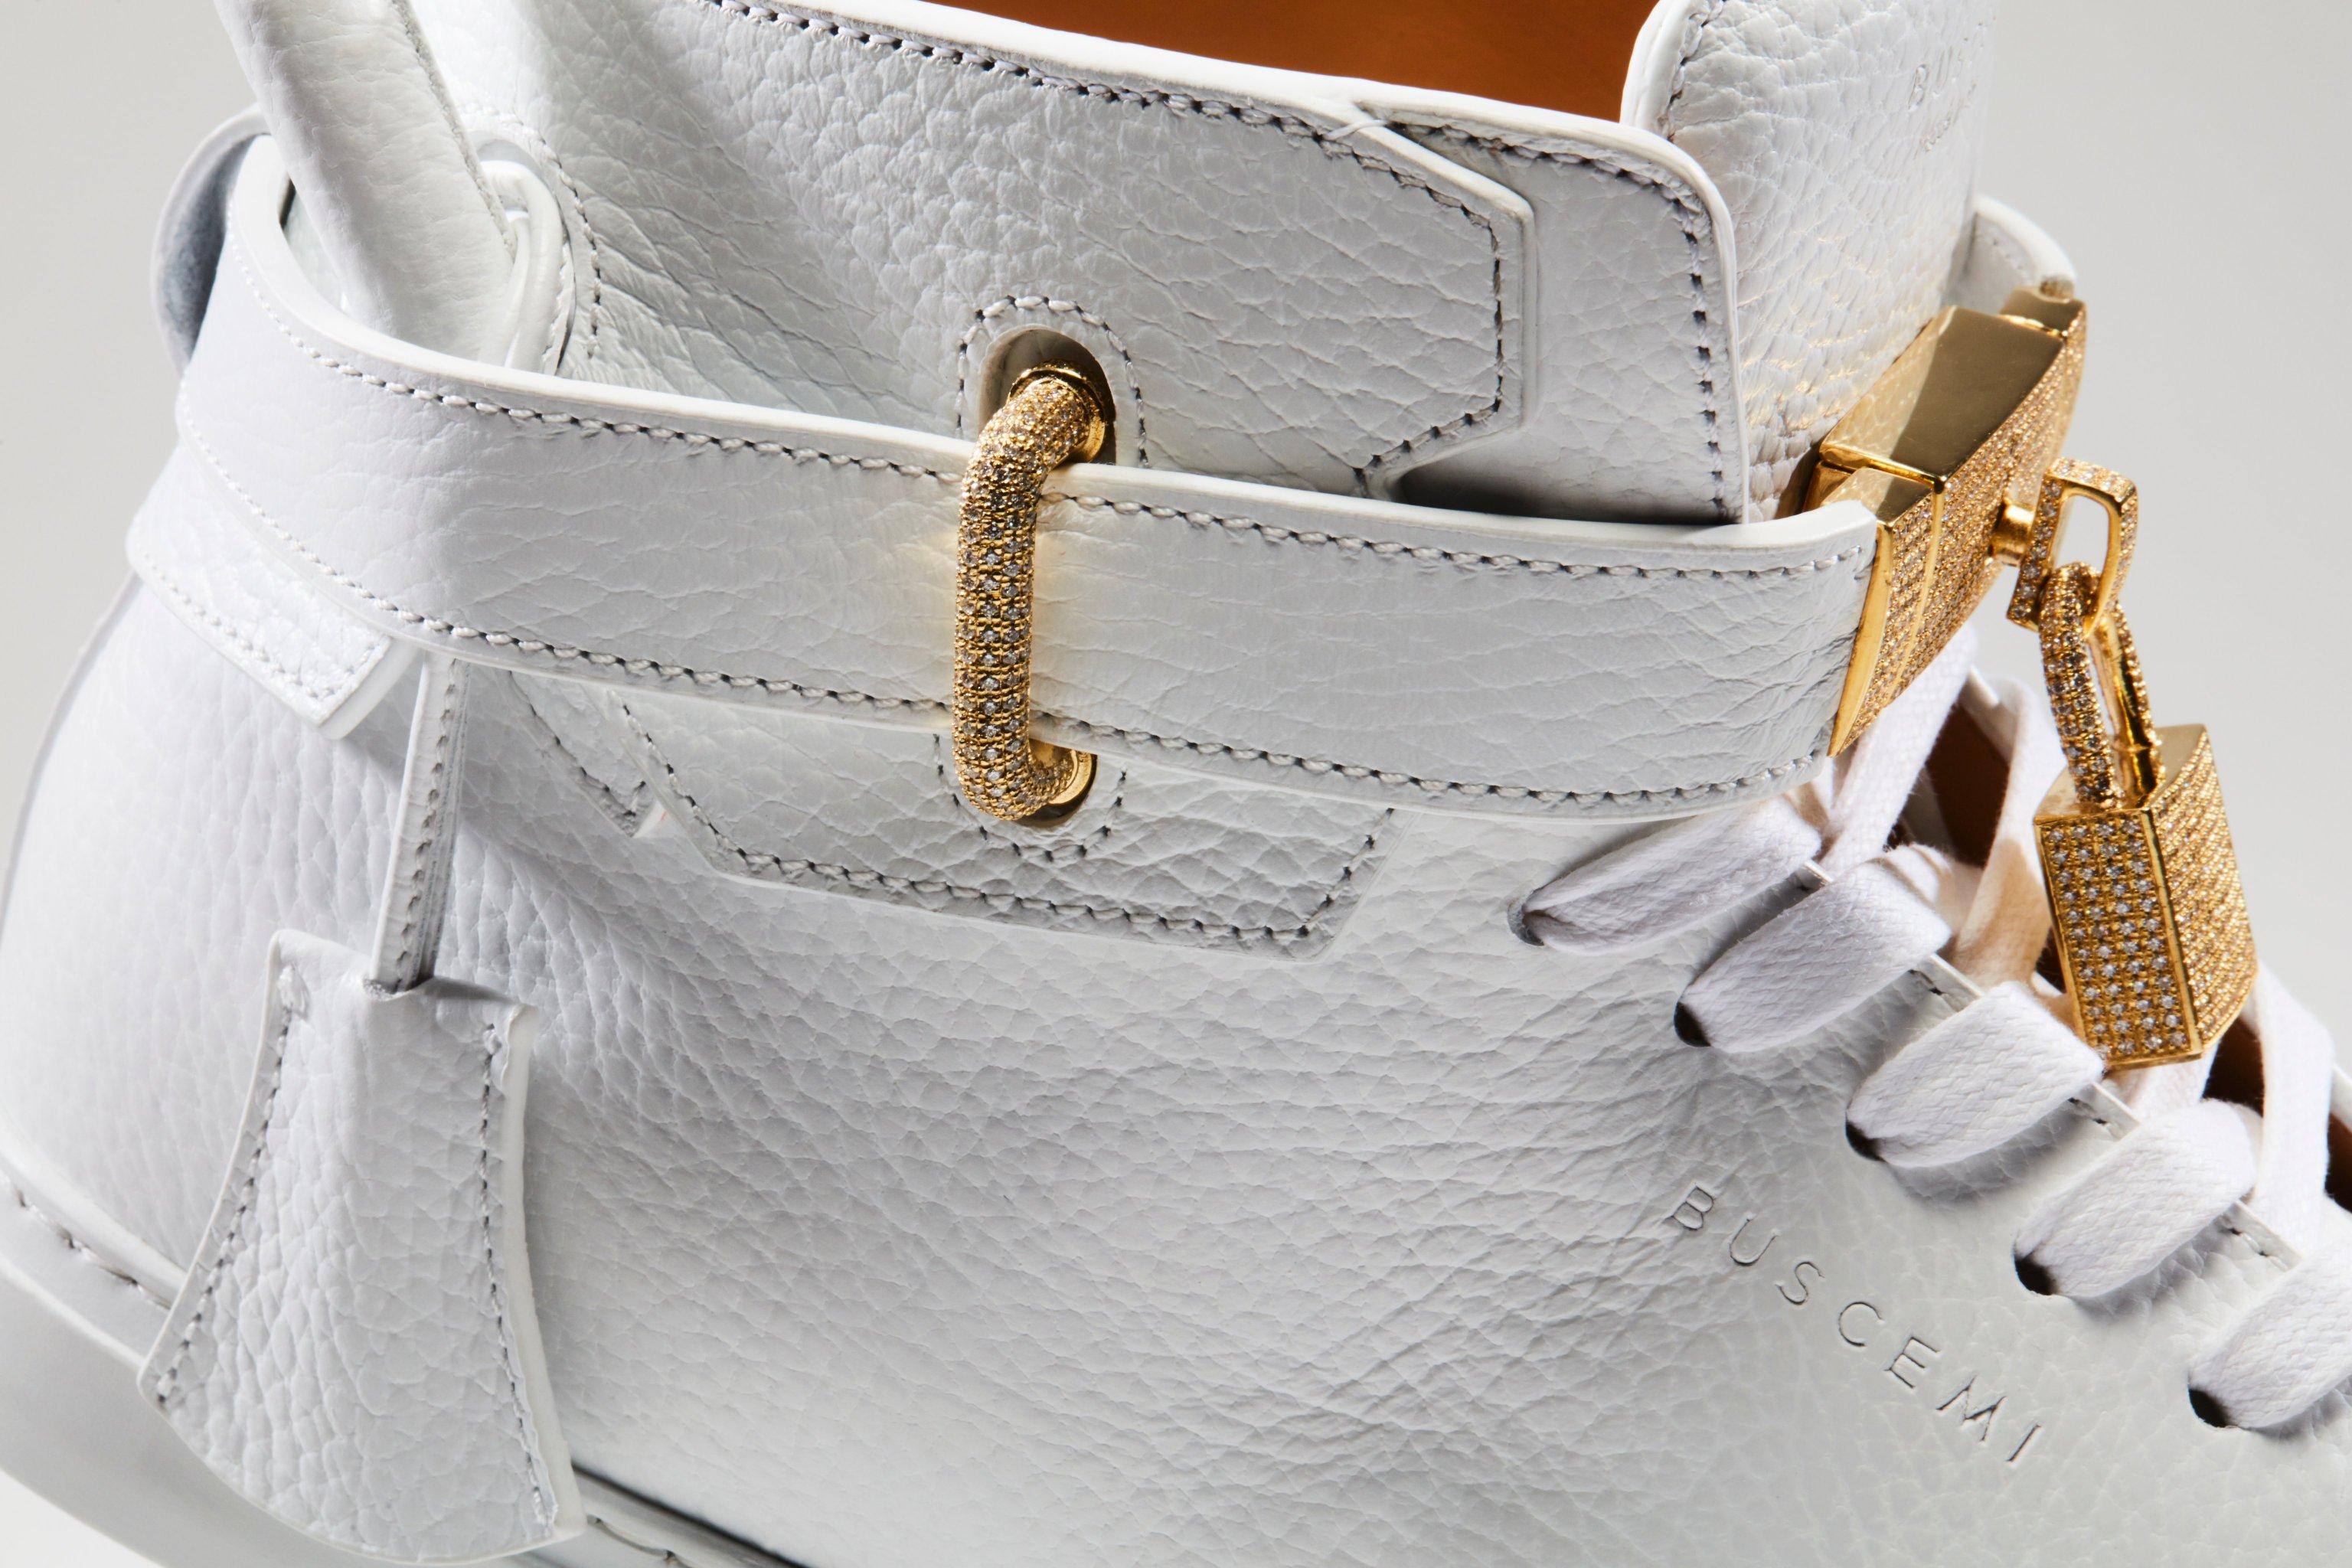 Buscemi sneakers -- marketing genius or